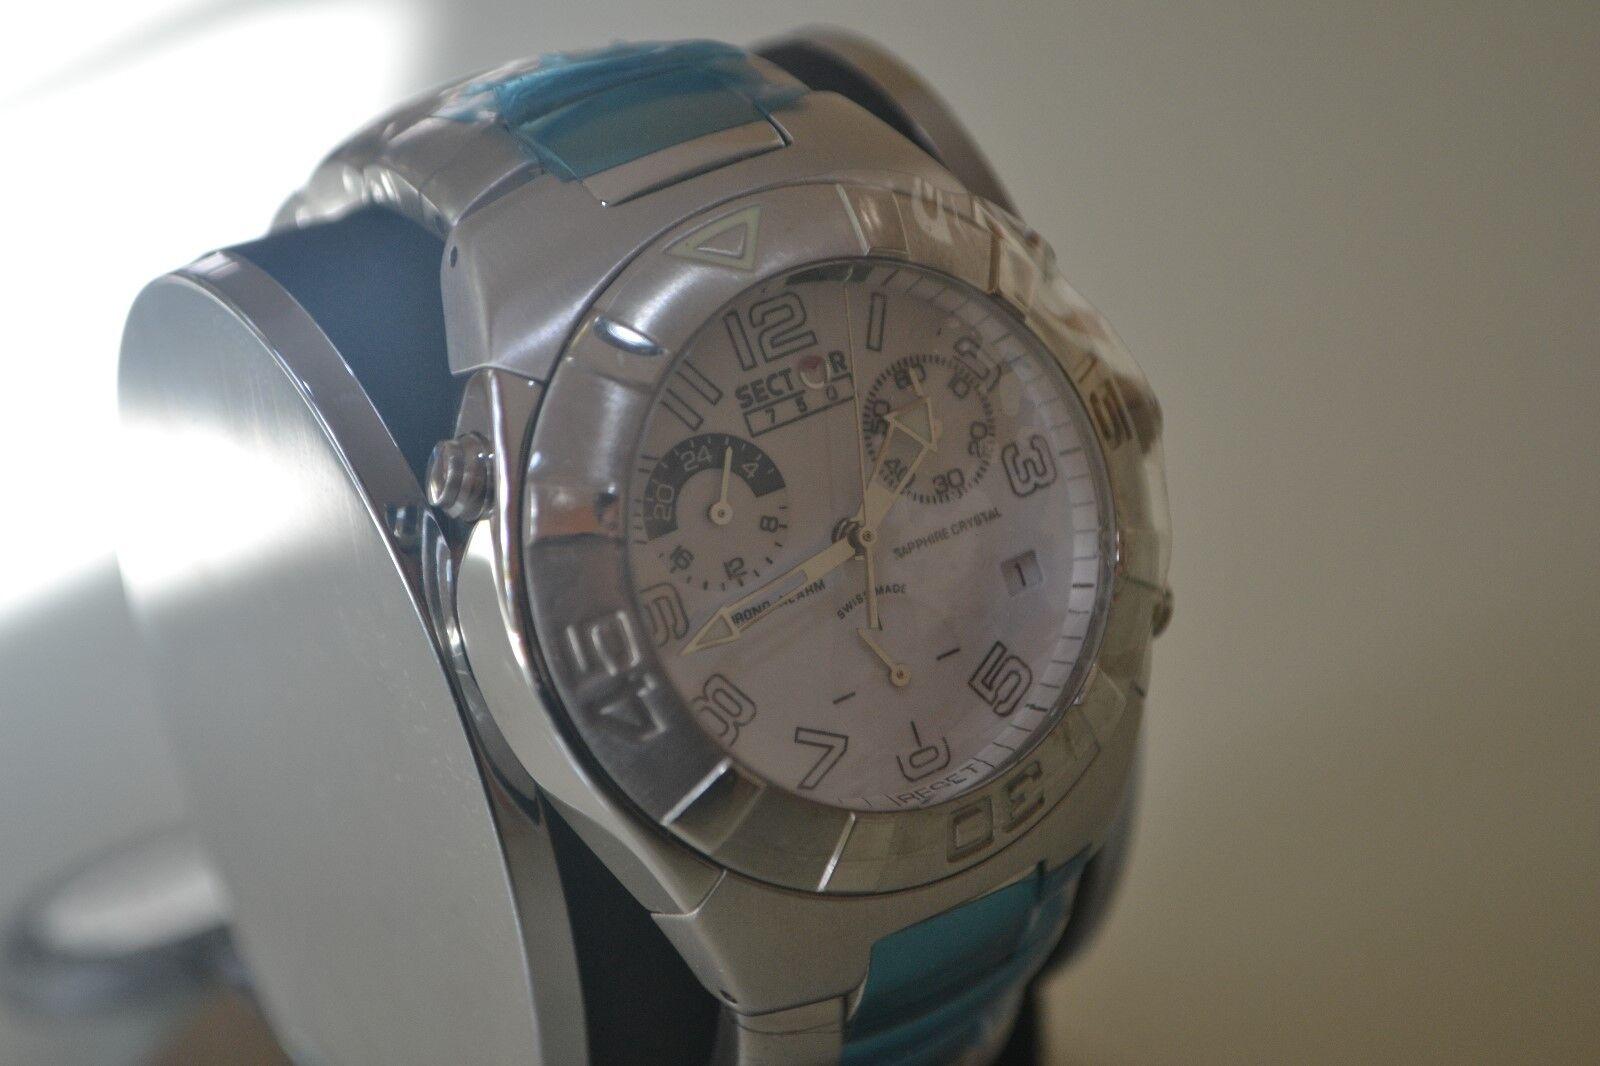 Alarma 750 Crono Zafiro Hombre Vintage Sector Reloj Cristal fgYy6b7v